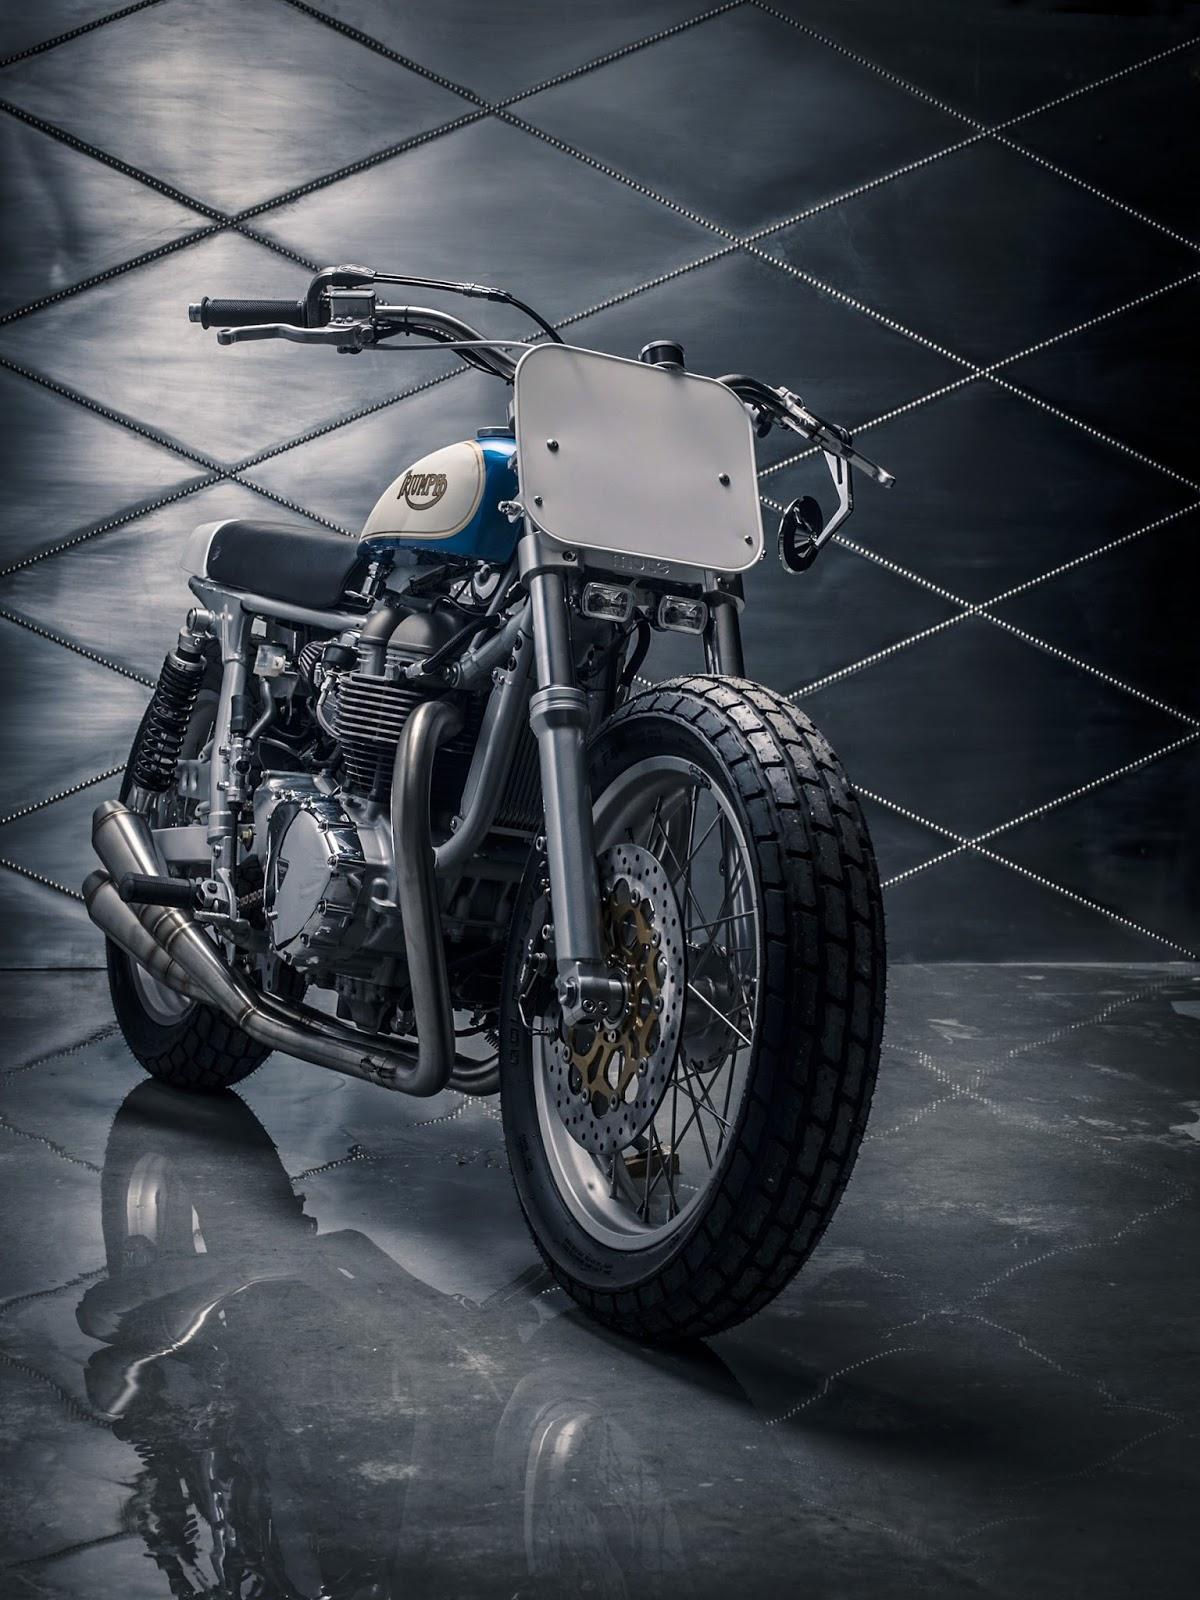 Triumph Bonneville Modified To Classic Tracker Mule Motorcycles